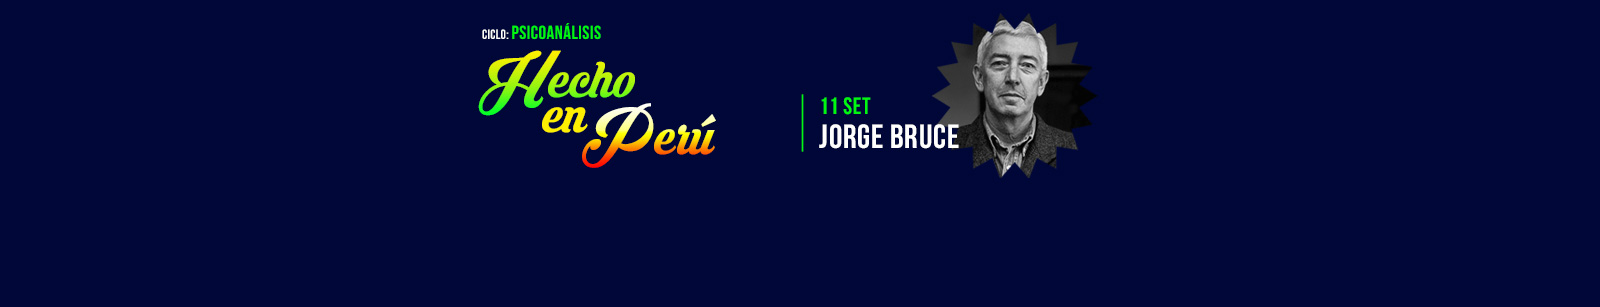 Jorge Bruce: Psicoanálisis, Hecho en Perú